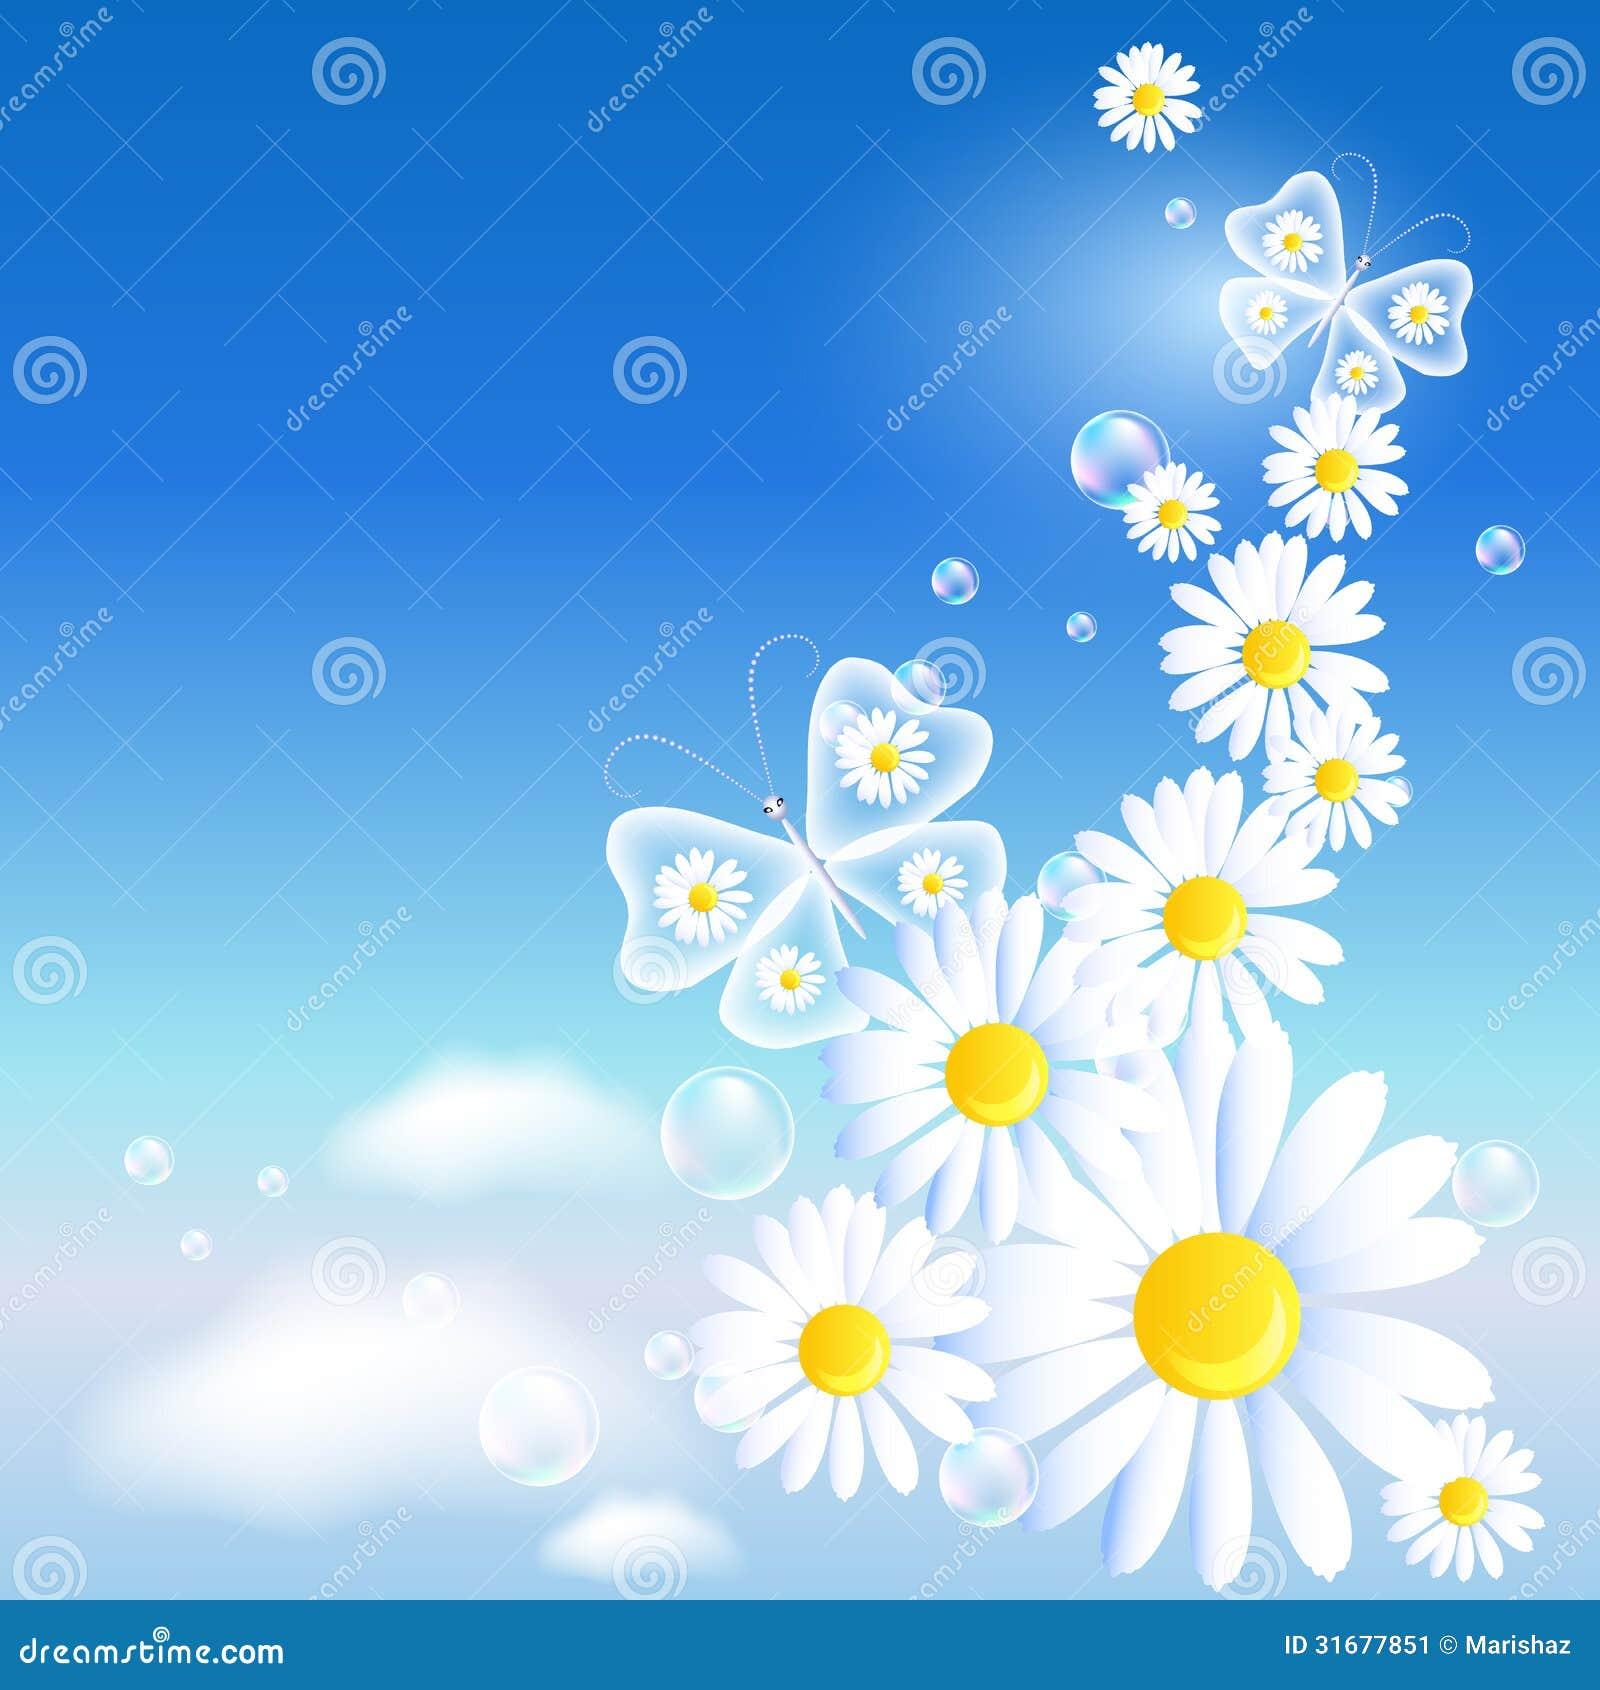 Vlinders en madeliefje in de hemel